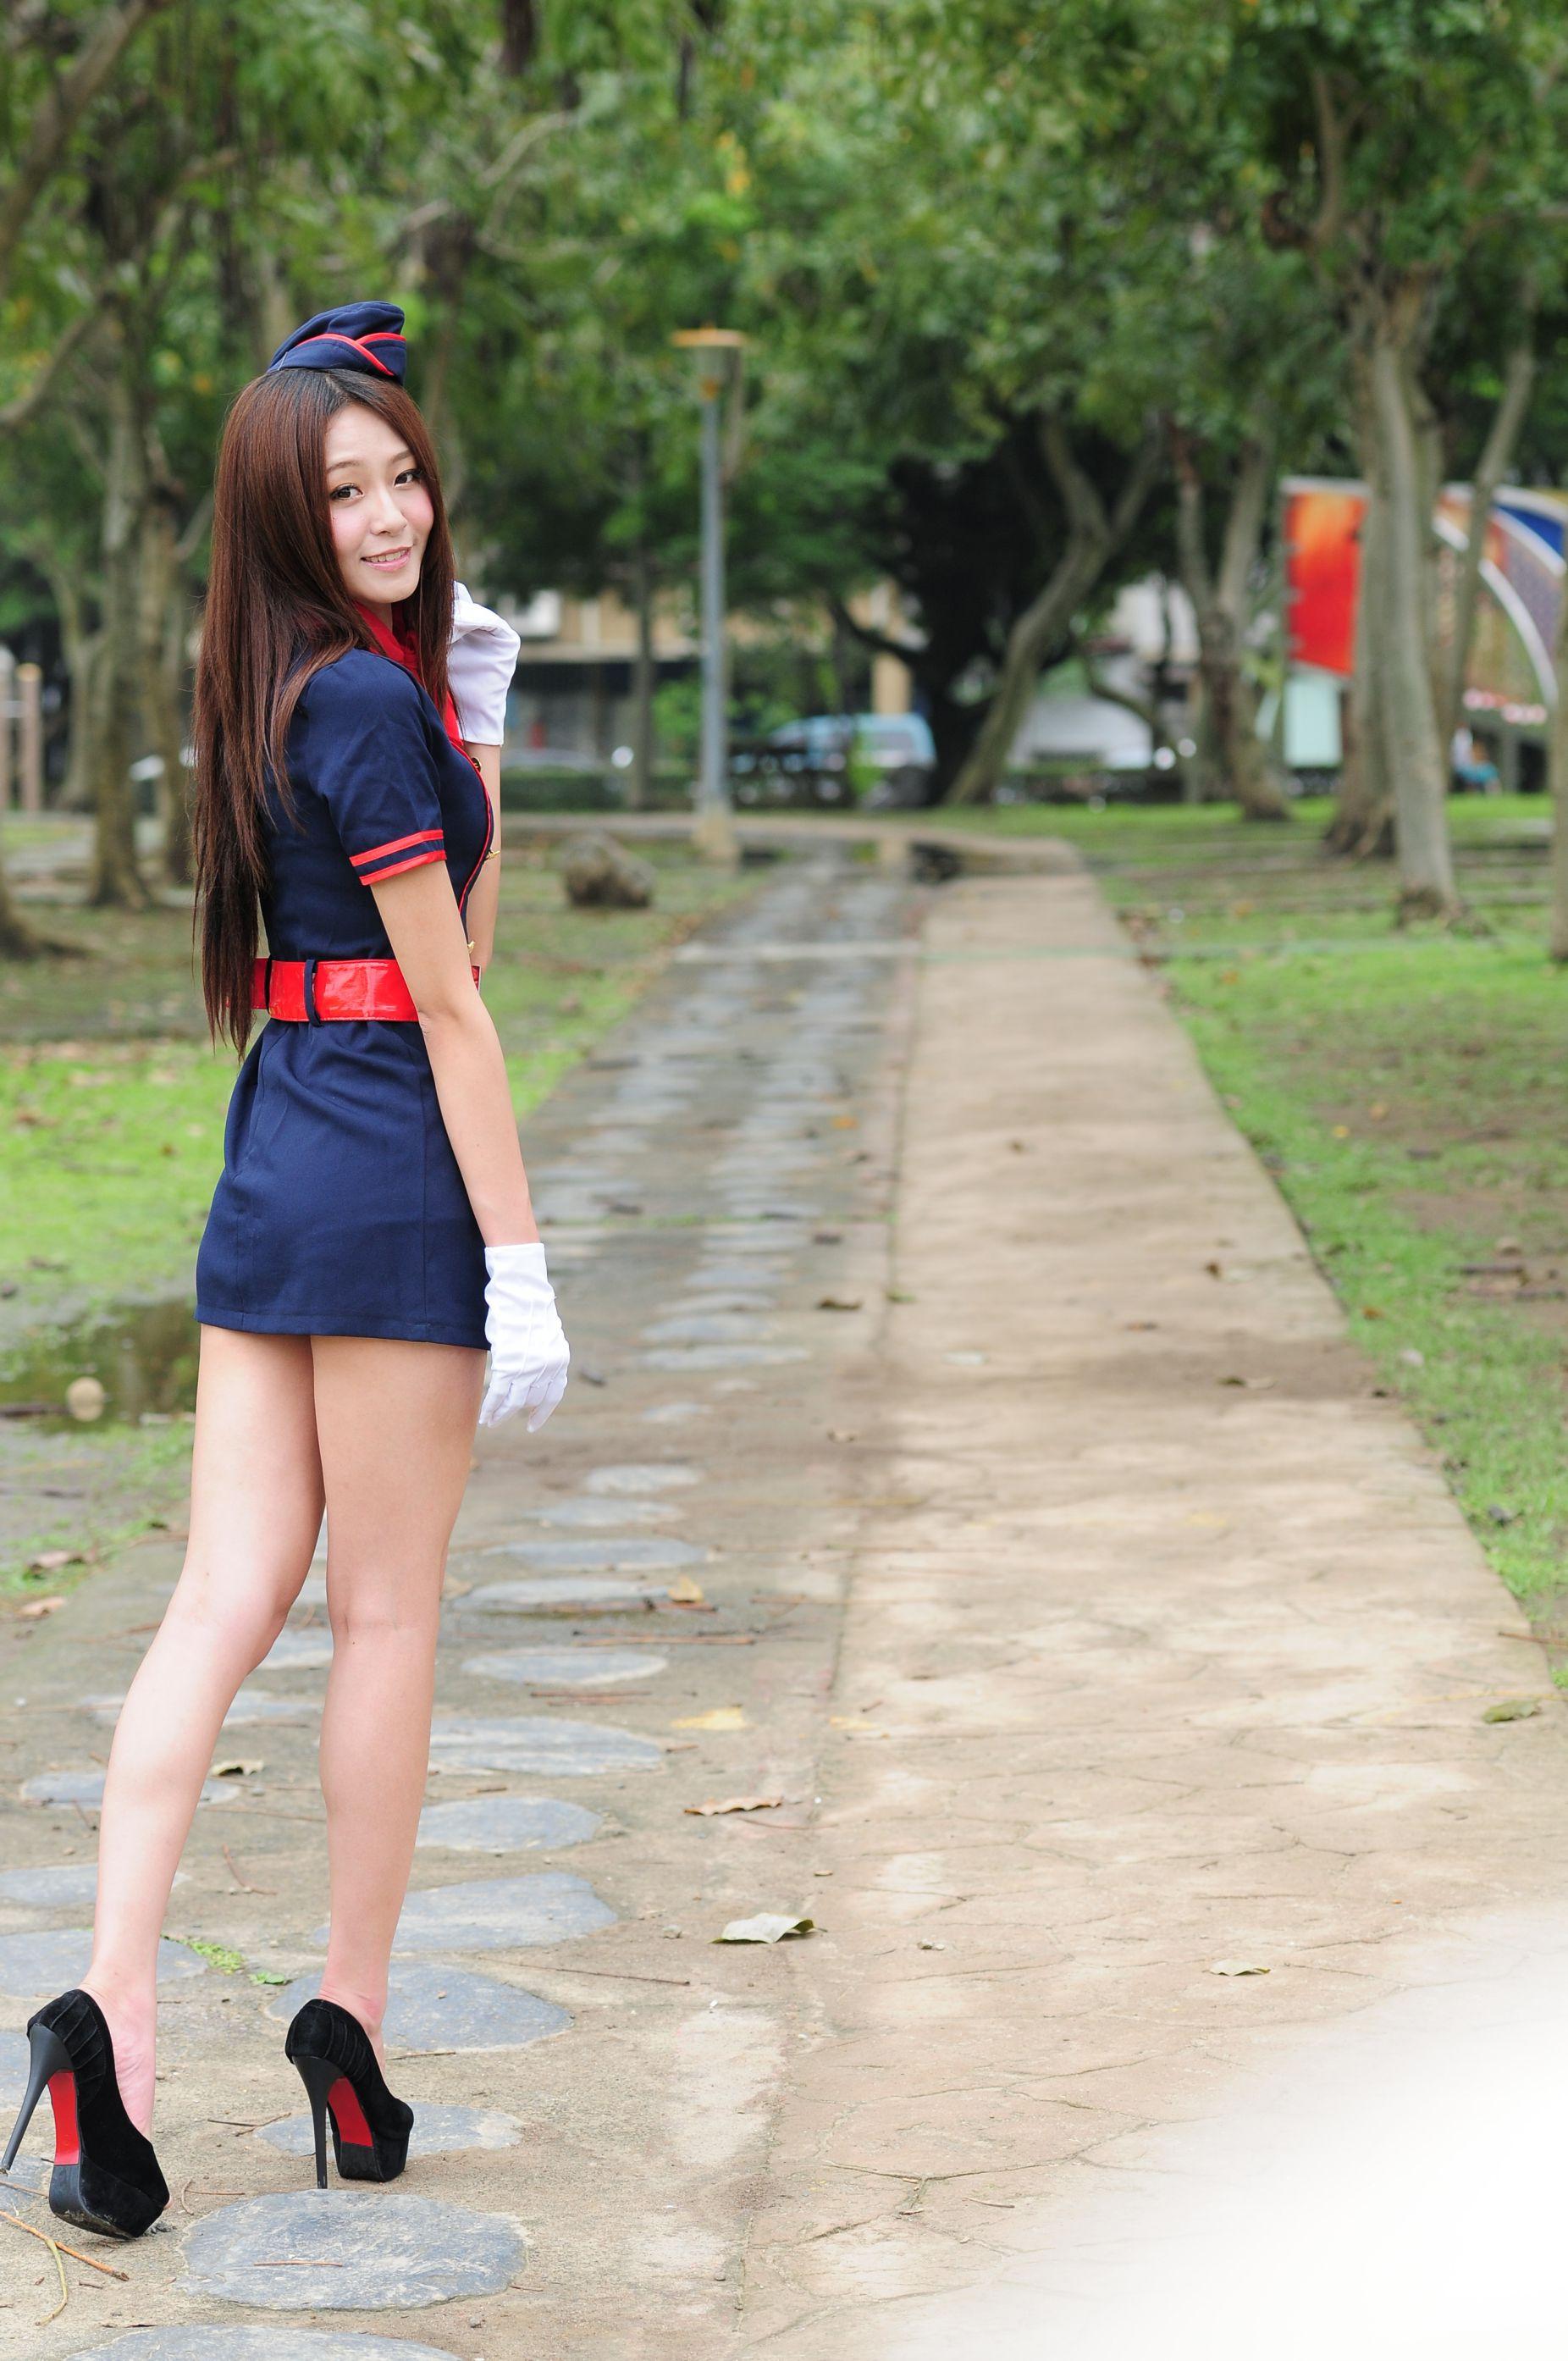 VOL.1413 [台湾正妹]清新户外美女:Winnie小雪(庄咏惠,庄温妮,腿模Winnie)高品质写真套图(67P)